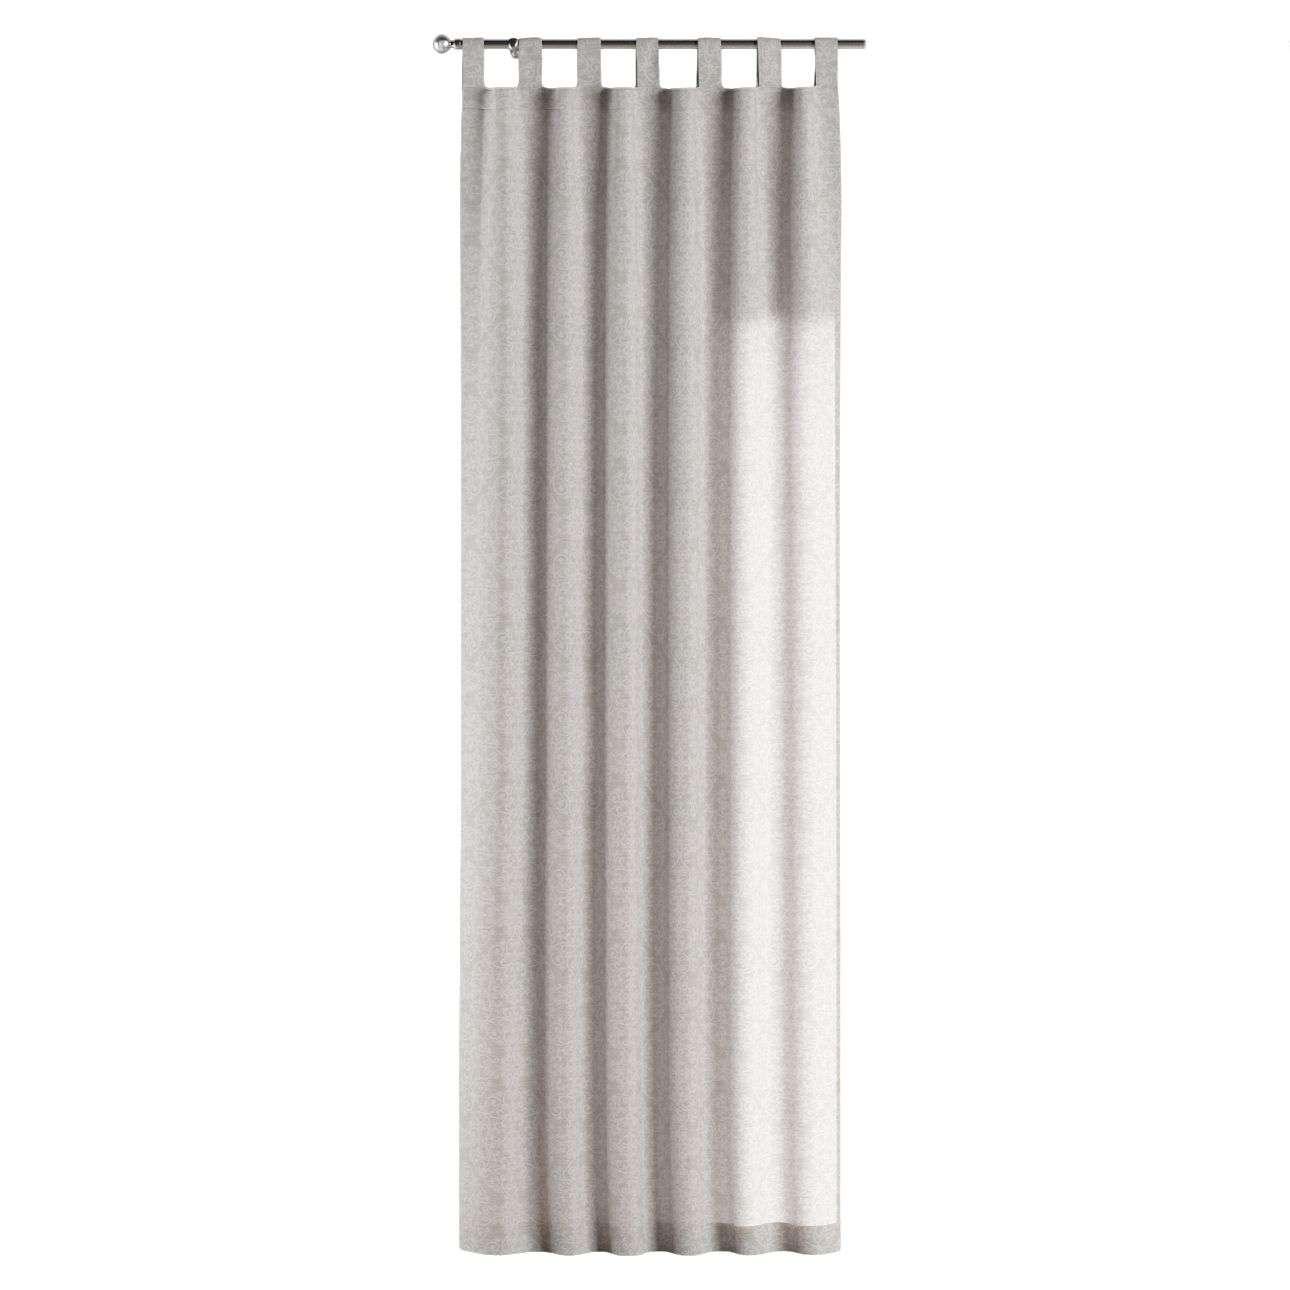 Gardin med stropper 130 x 260 cm fra kollektionen Venice , Stof: 140-49